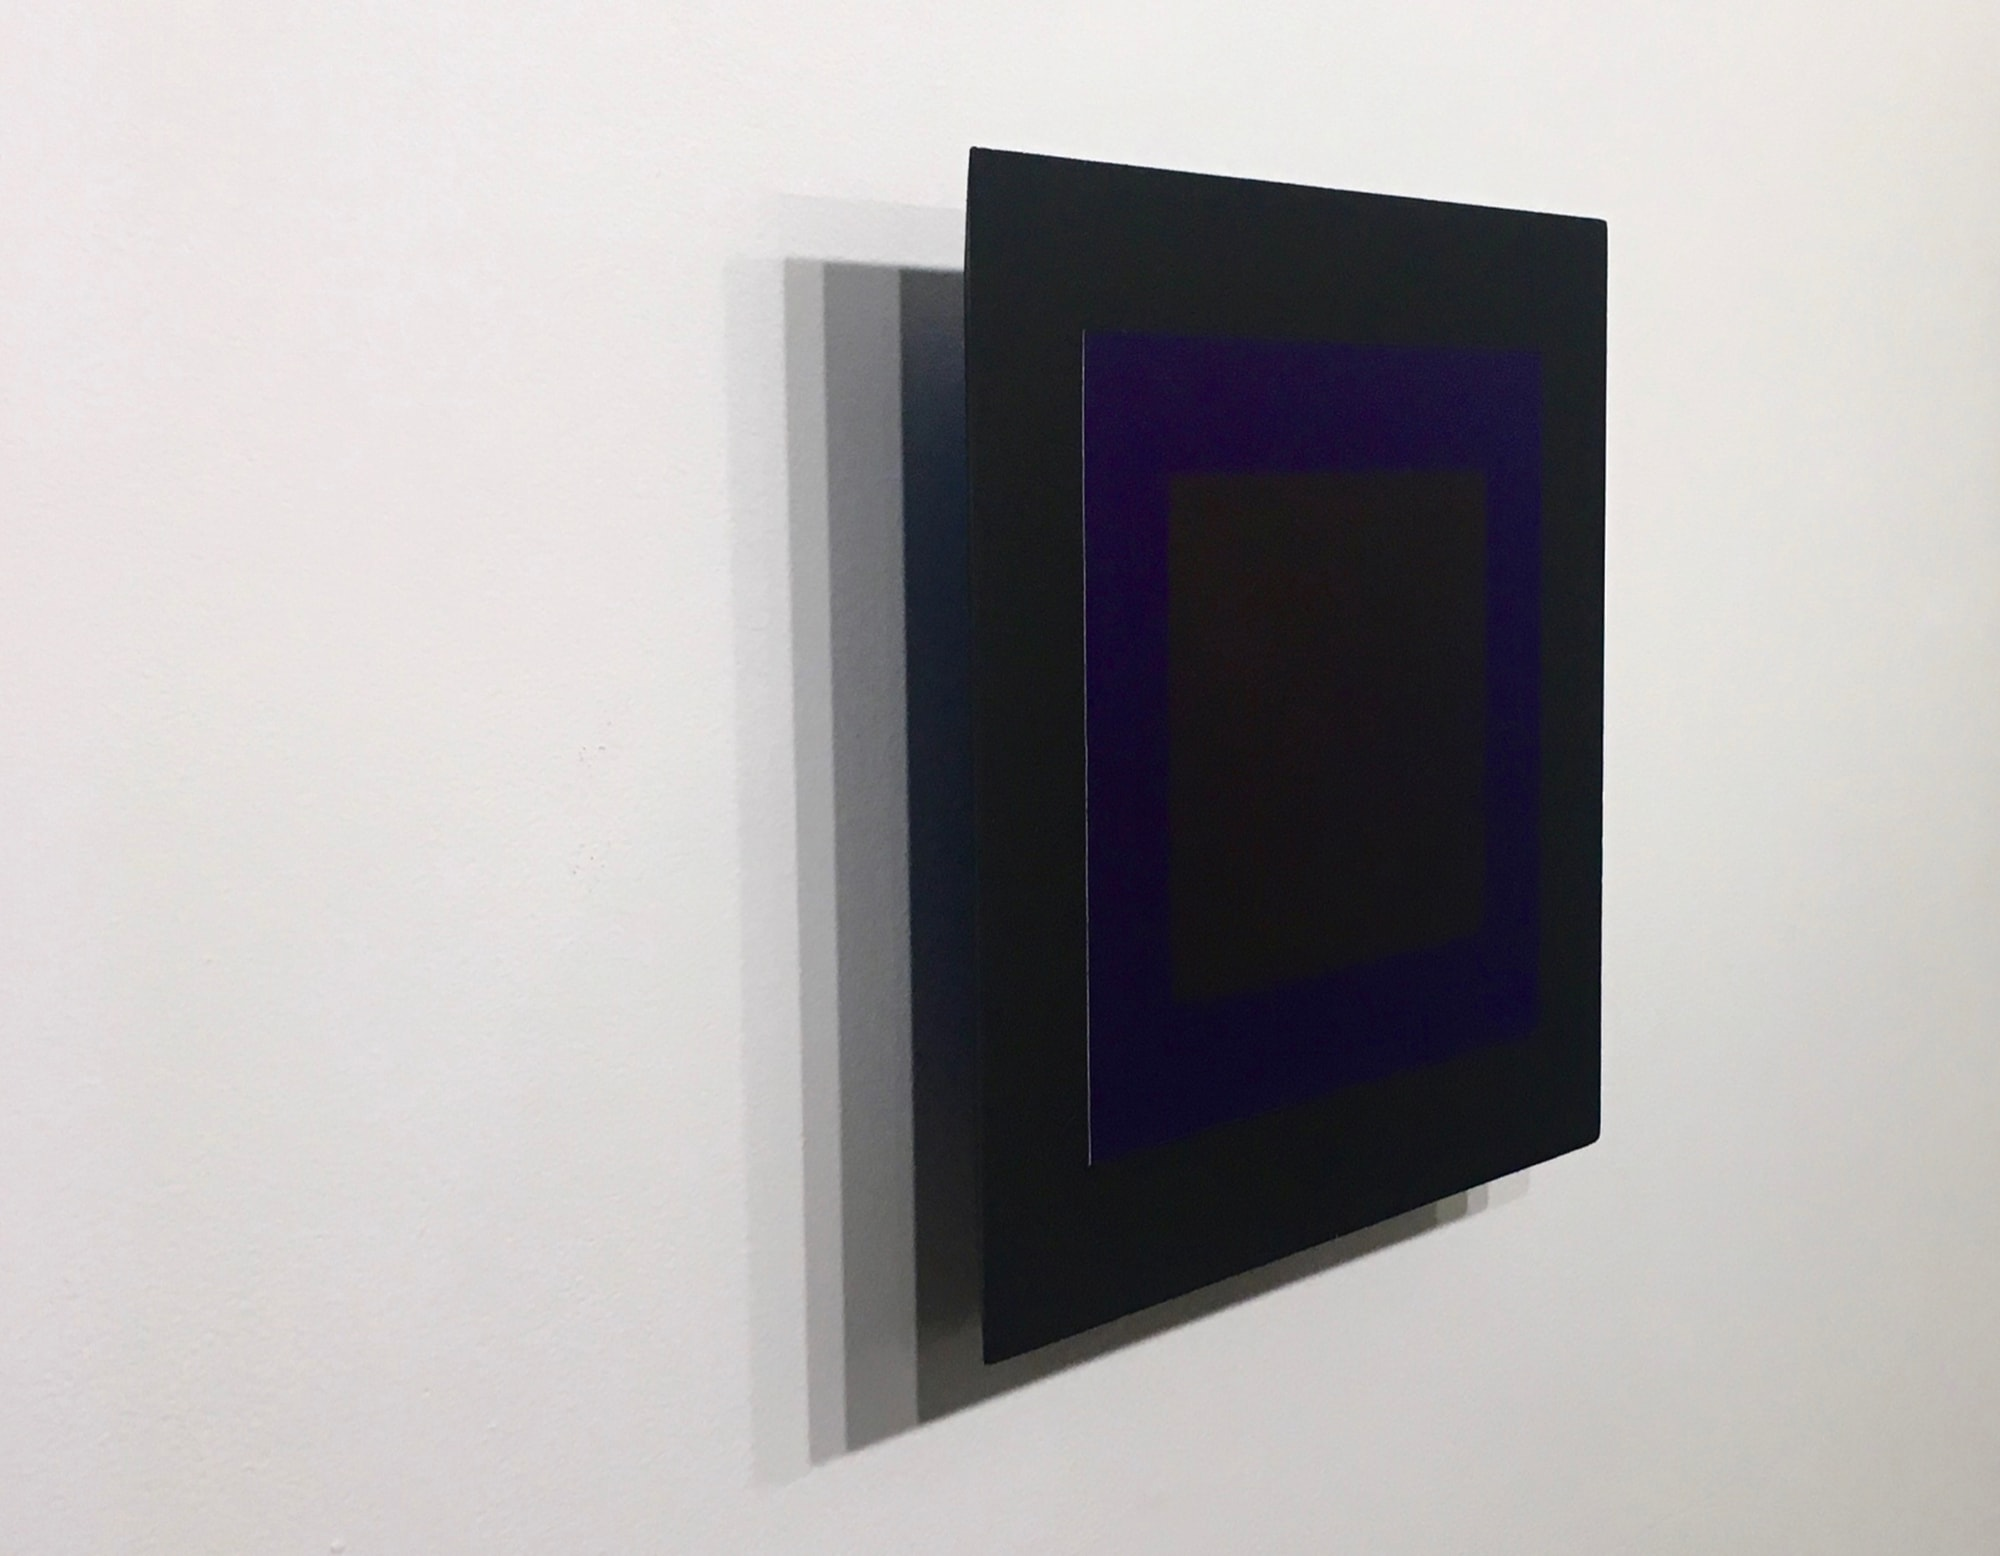 Randy Gibson's <em>Quadrilateral Starfield Symmetry A:L II - Homage</em>